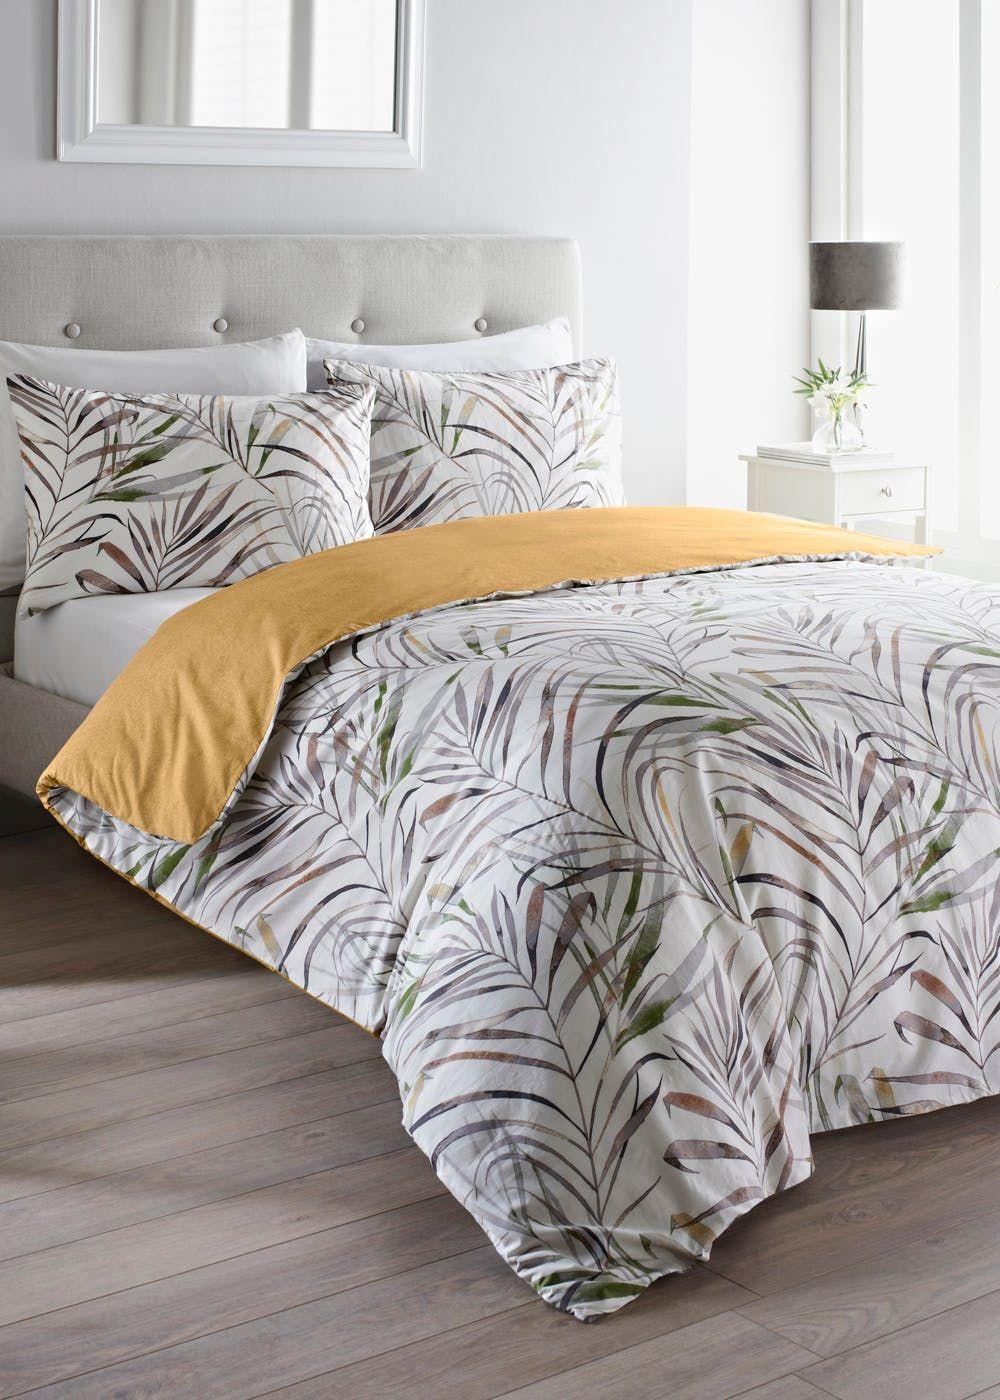 100 Cotton Palm Leaf Duvet Cover Multi Tropical Duvet Cover Bedding Inspiration Best Bedding Sets